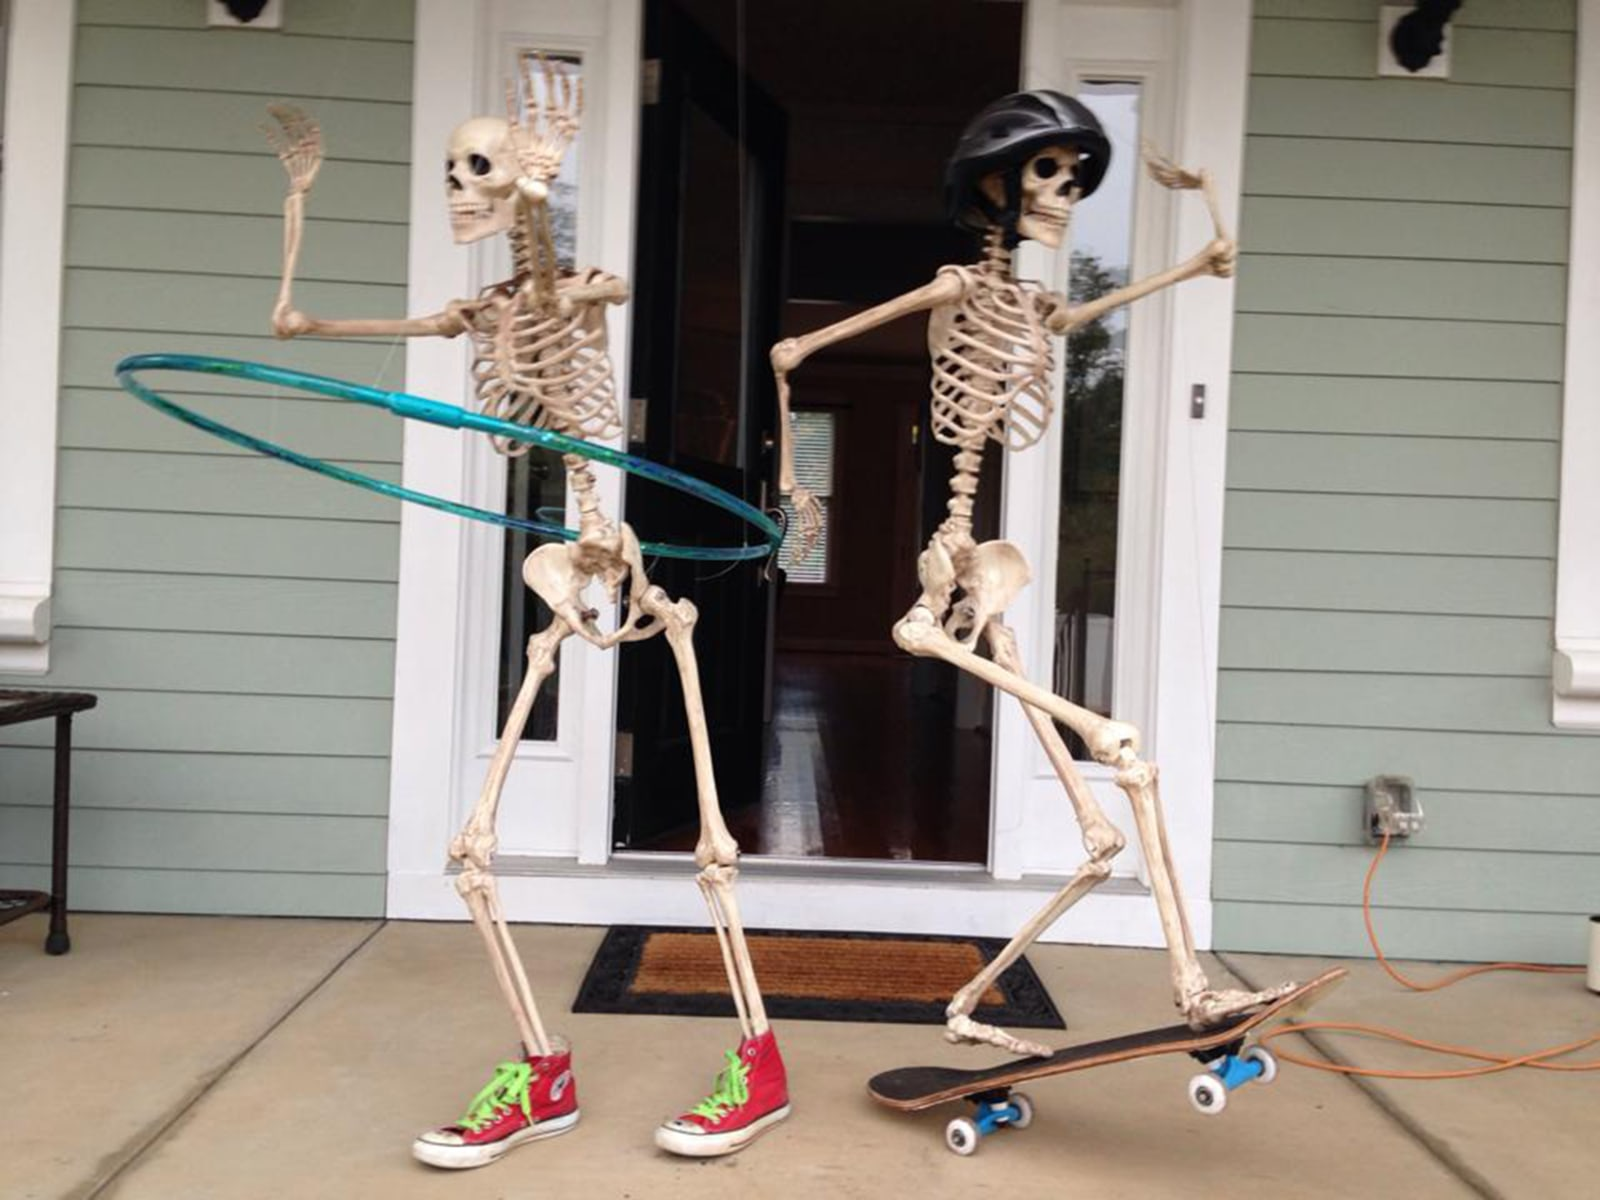 Halloween skeleton decorations - 1 Of 23